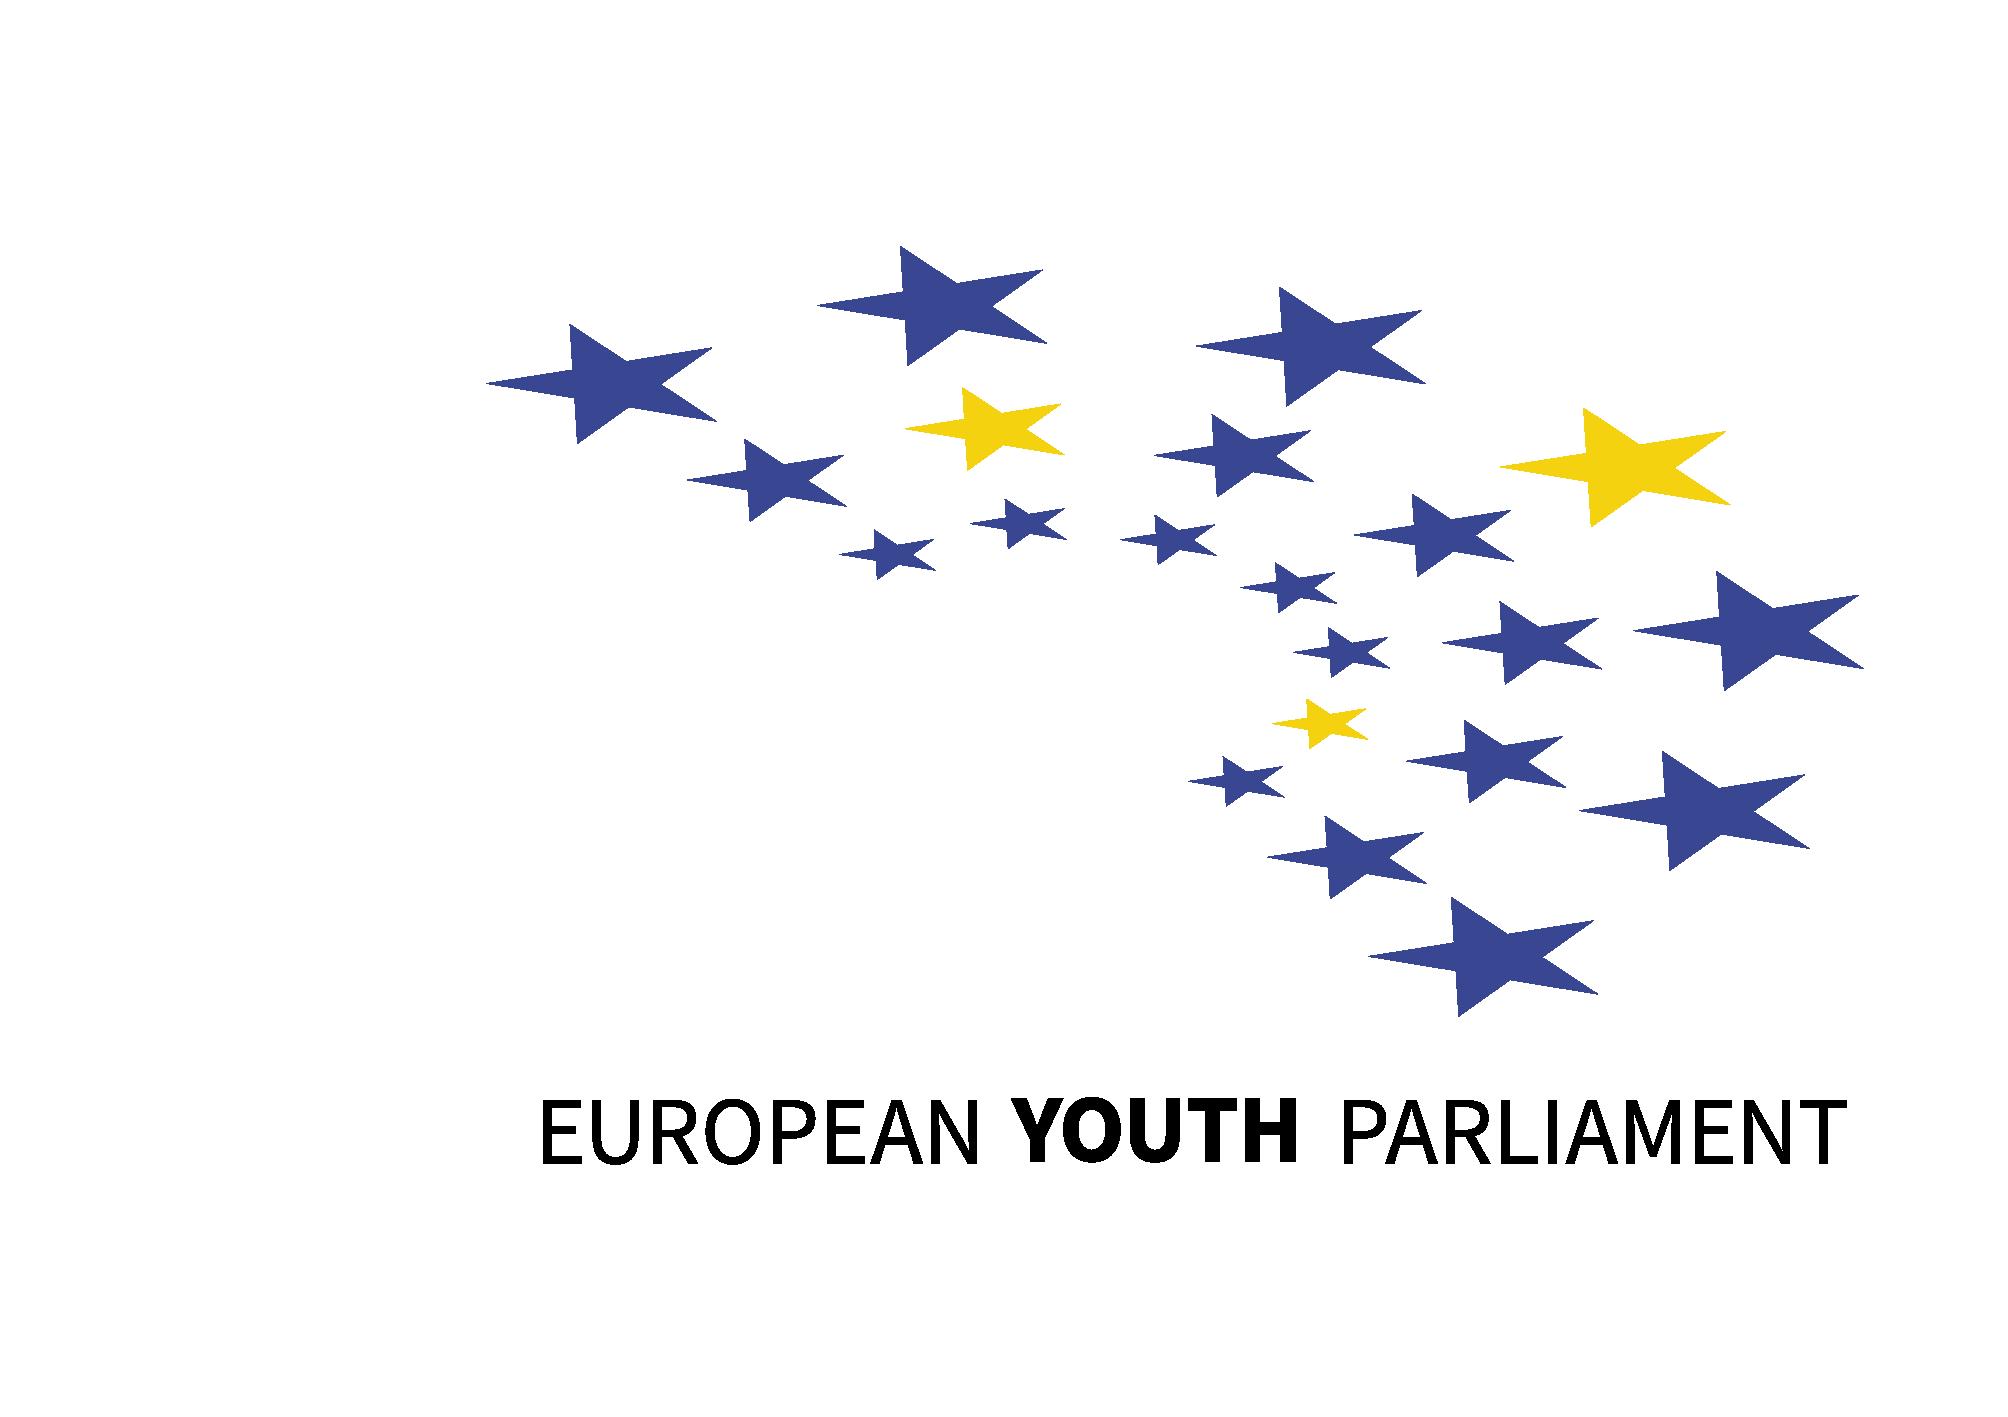 20150412_JP_EYP-Logo2015-4C-noBG-02-02